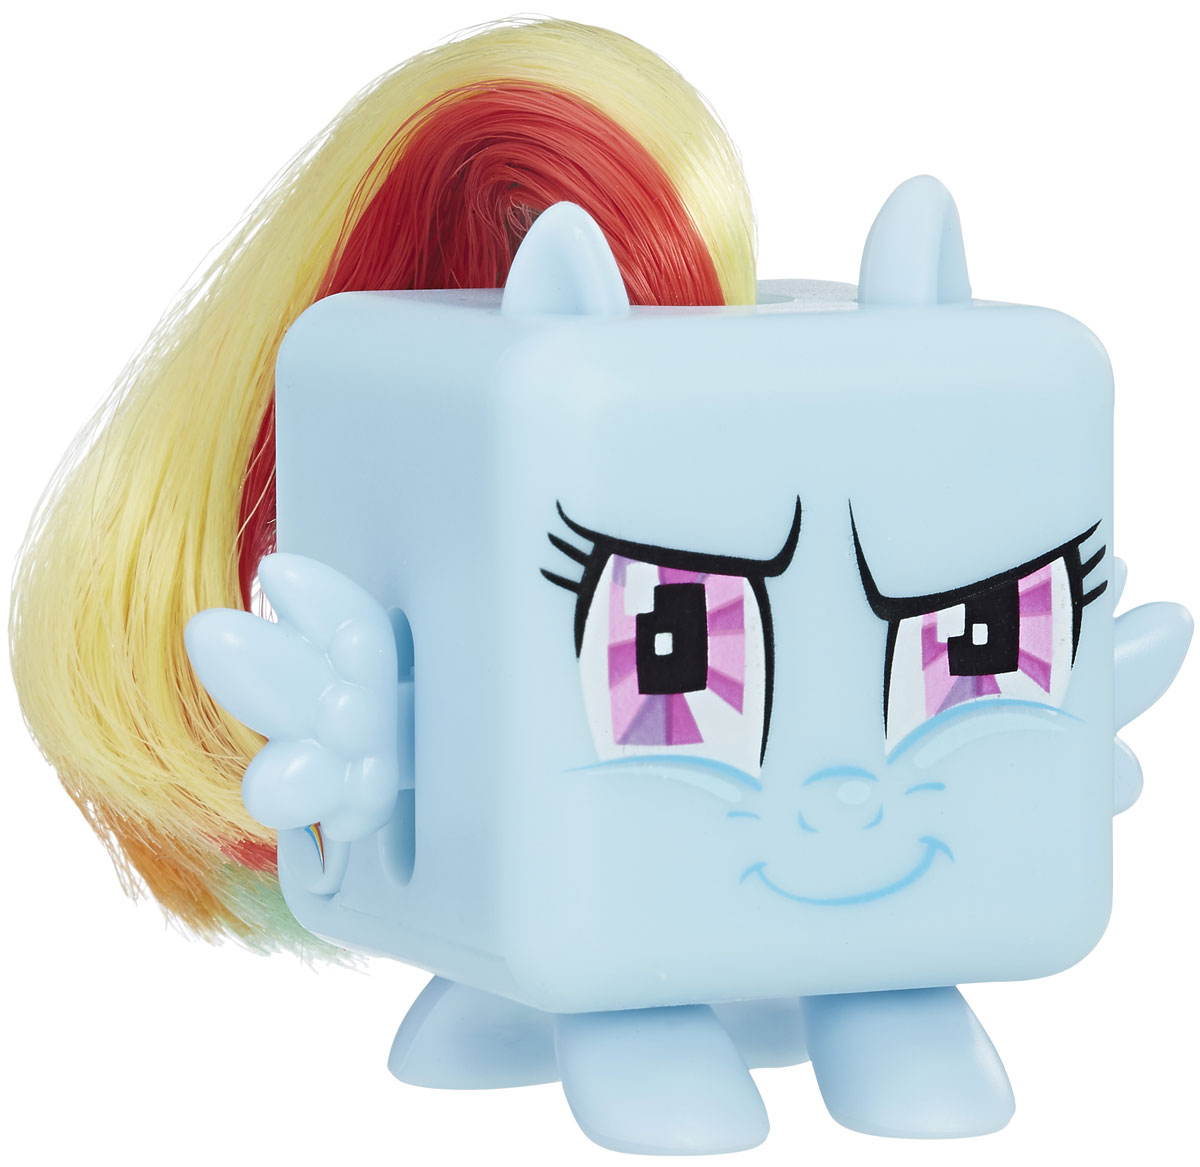 Fidget Its Антистрессовая игрушка Кубик My Little Pony C4558_C4575 мульти пульти мягкая игрушка принцесса луна 18 см со звуком my little pony мульти пульти